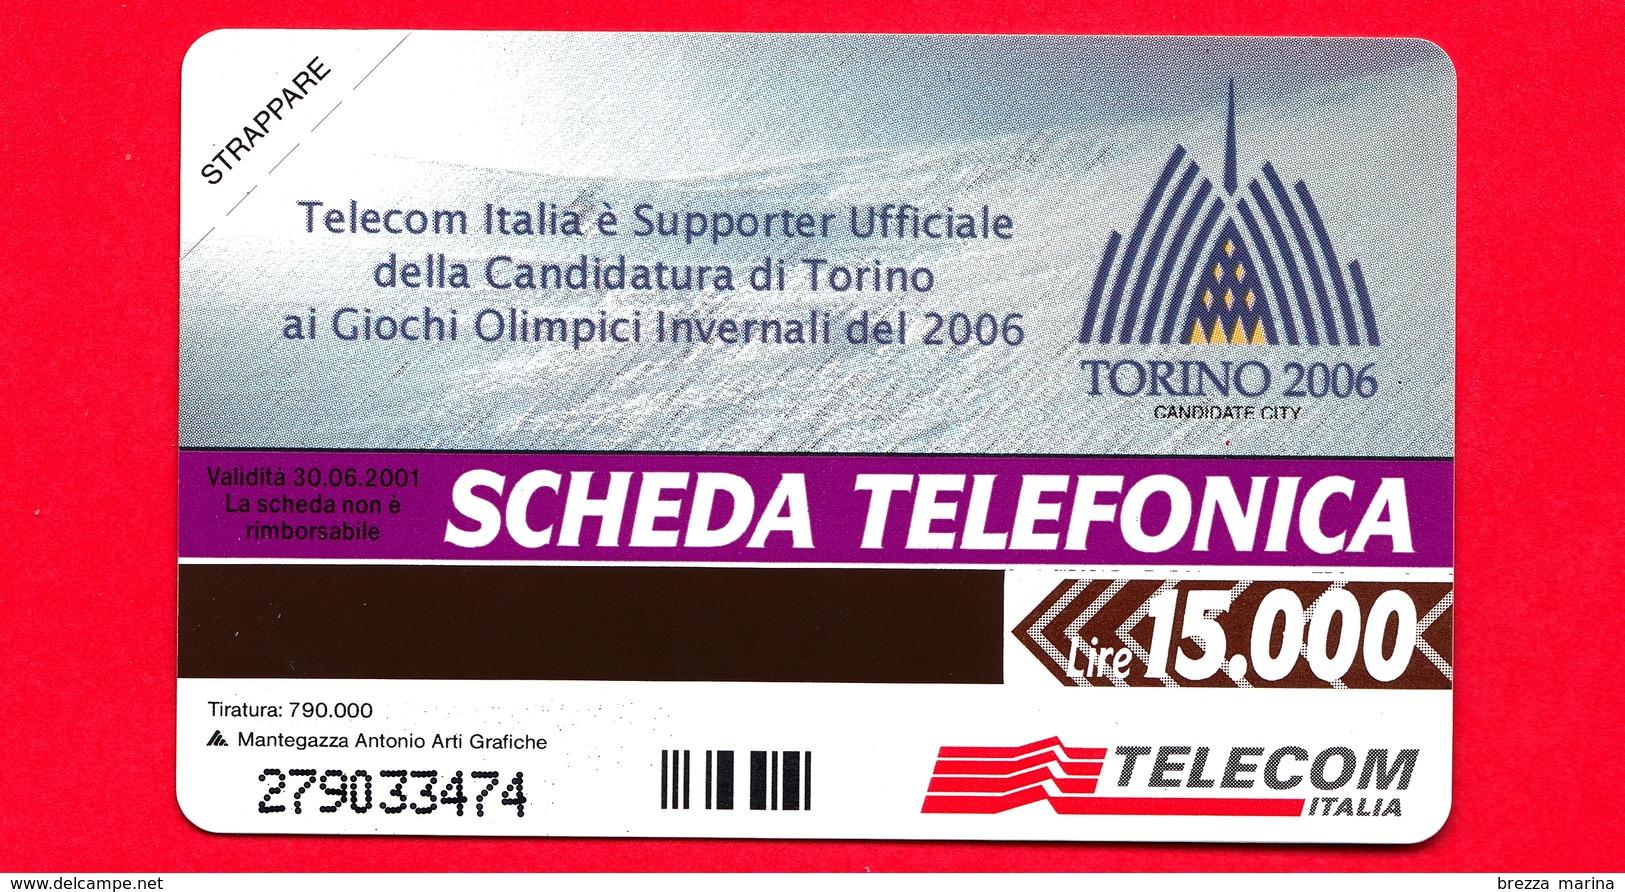 Nuova - MNH - ITALIA - Scheda Telefonica - Telecom - Torino 2006 - OCR 17 - C&C 3075  - Golden 959 - Italie